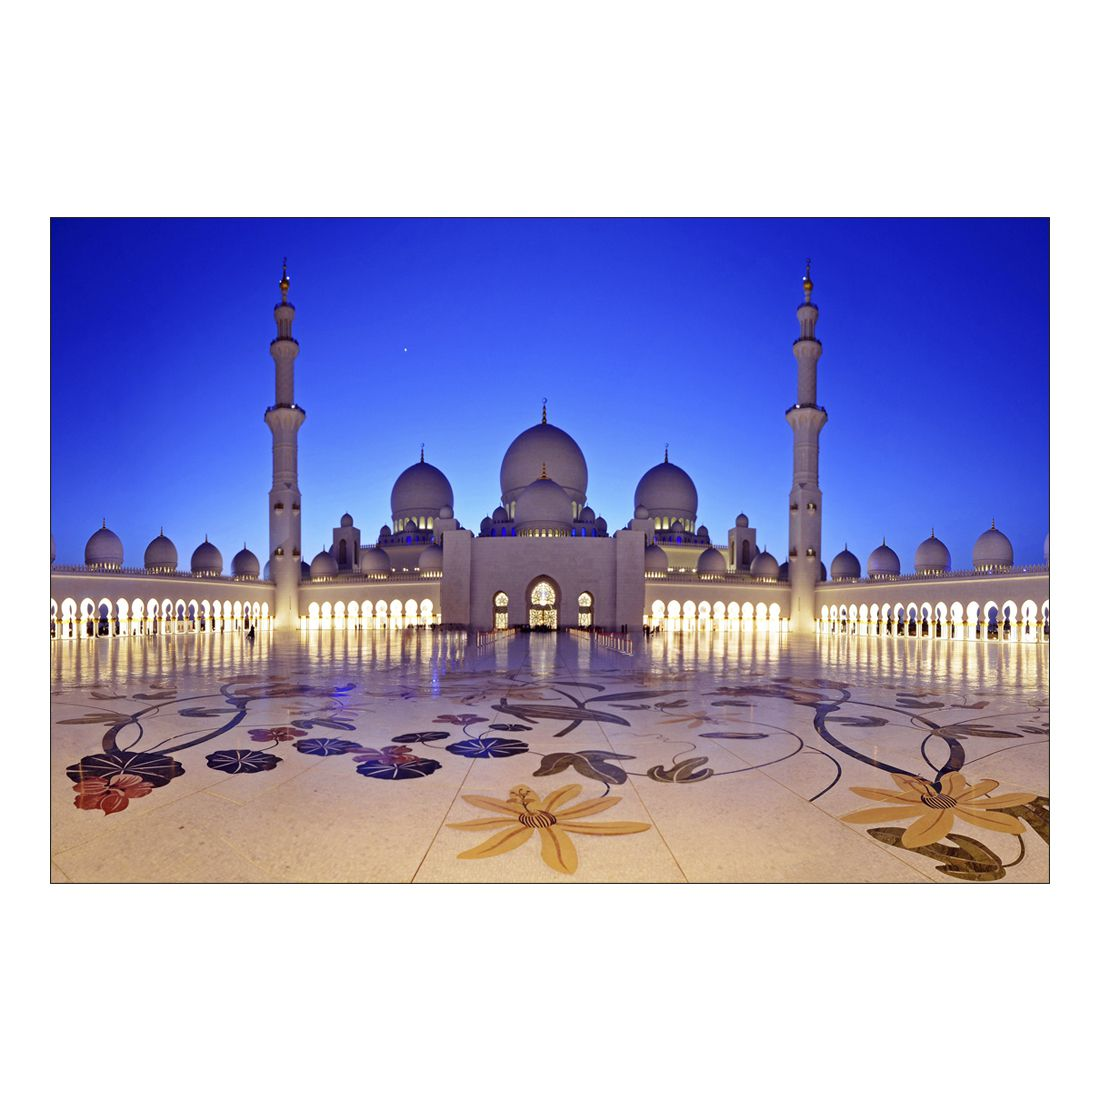 Acrylglasbild Mosque Istanbul – Abmessung 30×20 cm, Gallery of Innovative Art günstig bestellen